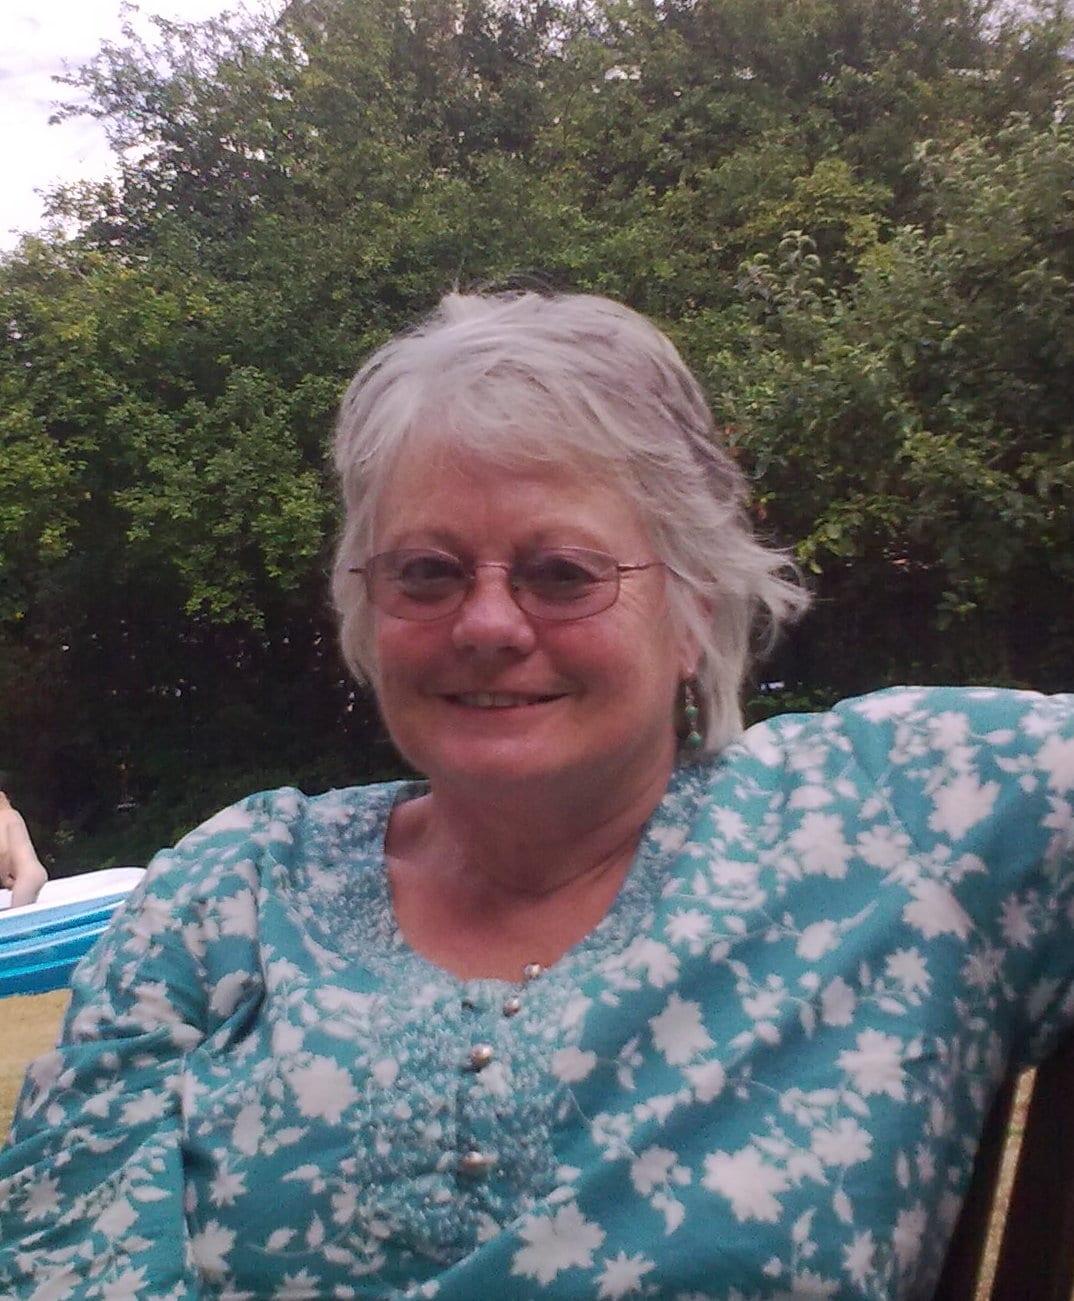 Tina from Welwyn Garden City